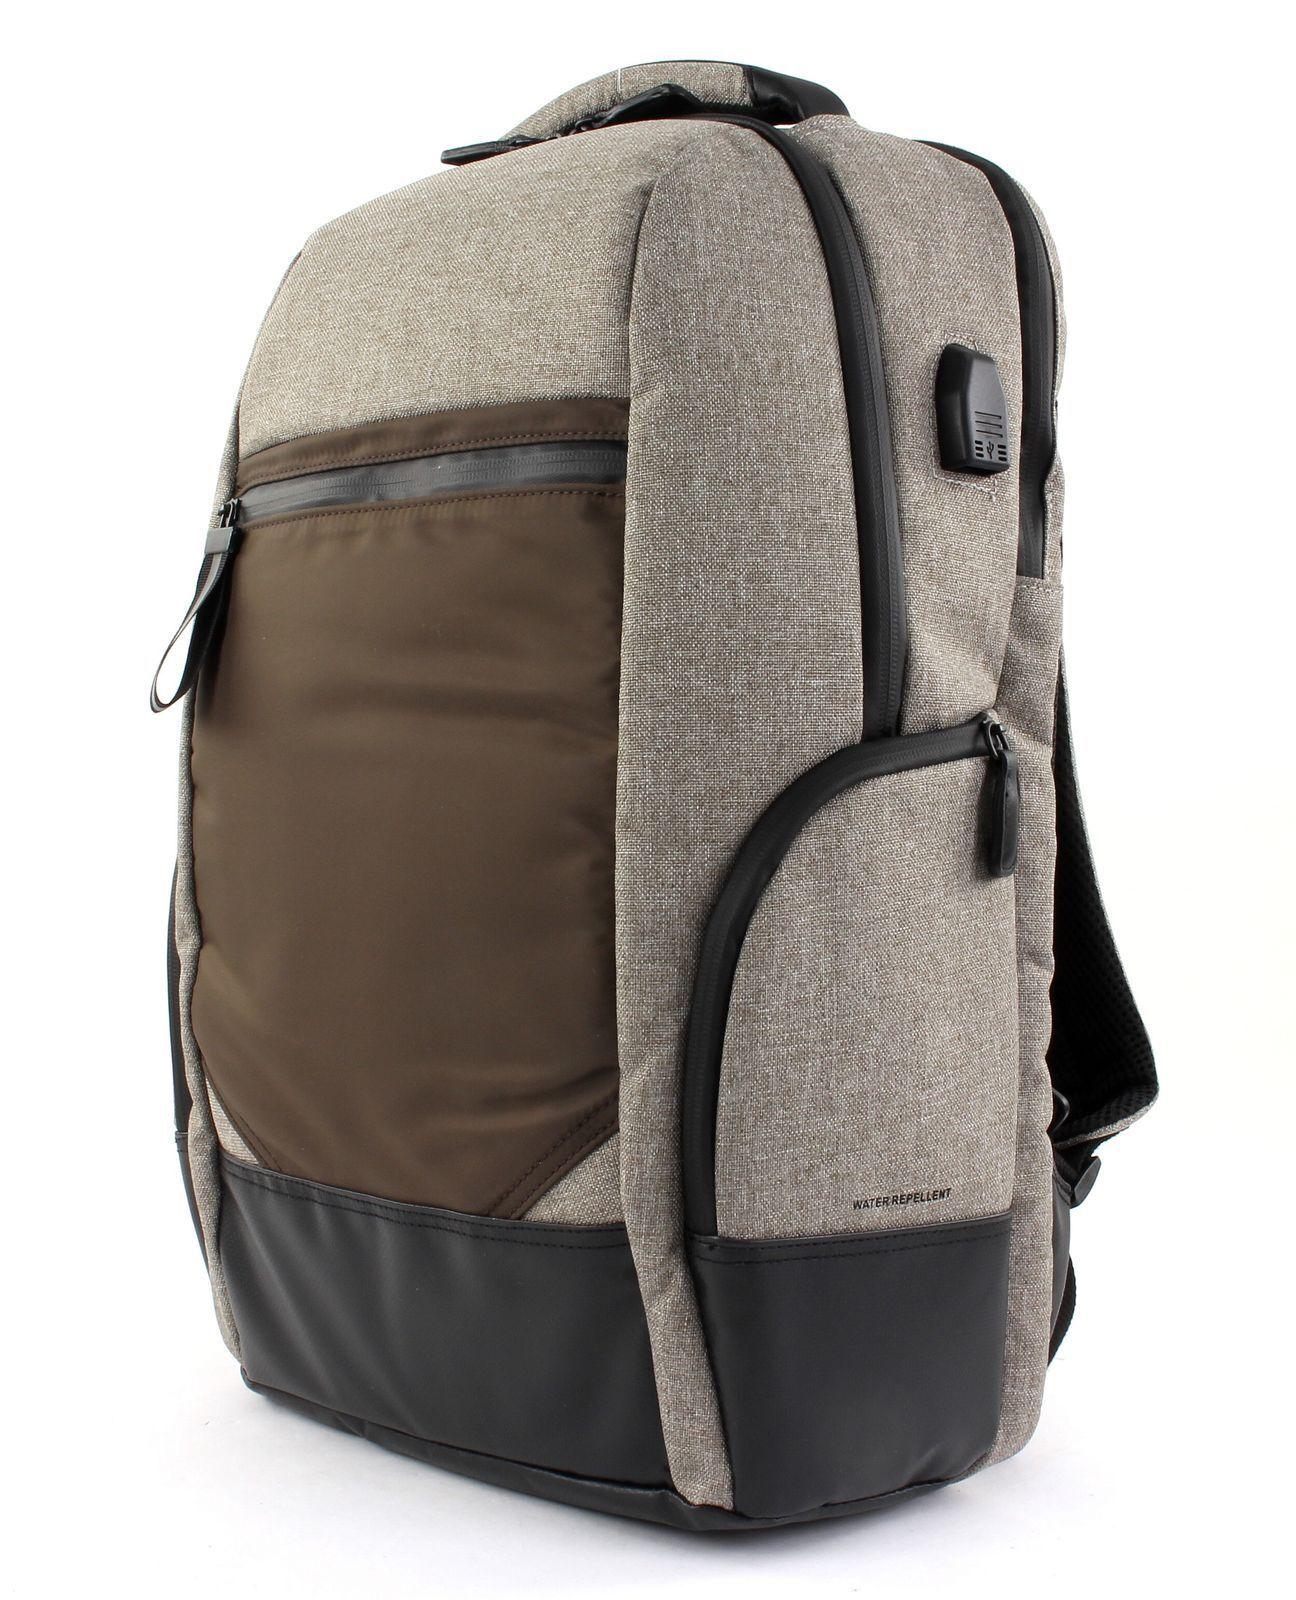 Kindermode, Schuhe & Access. Taschen LiliÓ Amsterdam M Backpack Rucksack Nougat Beige Neu